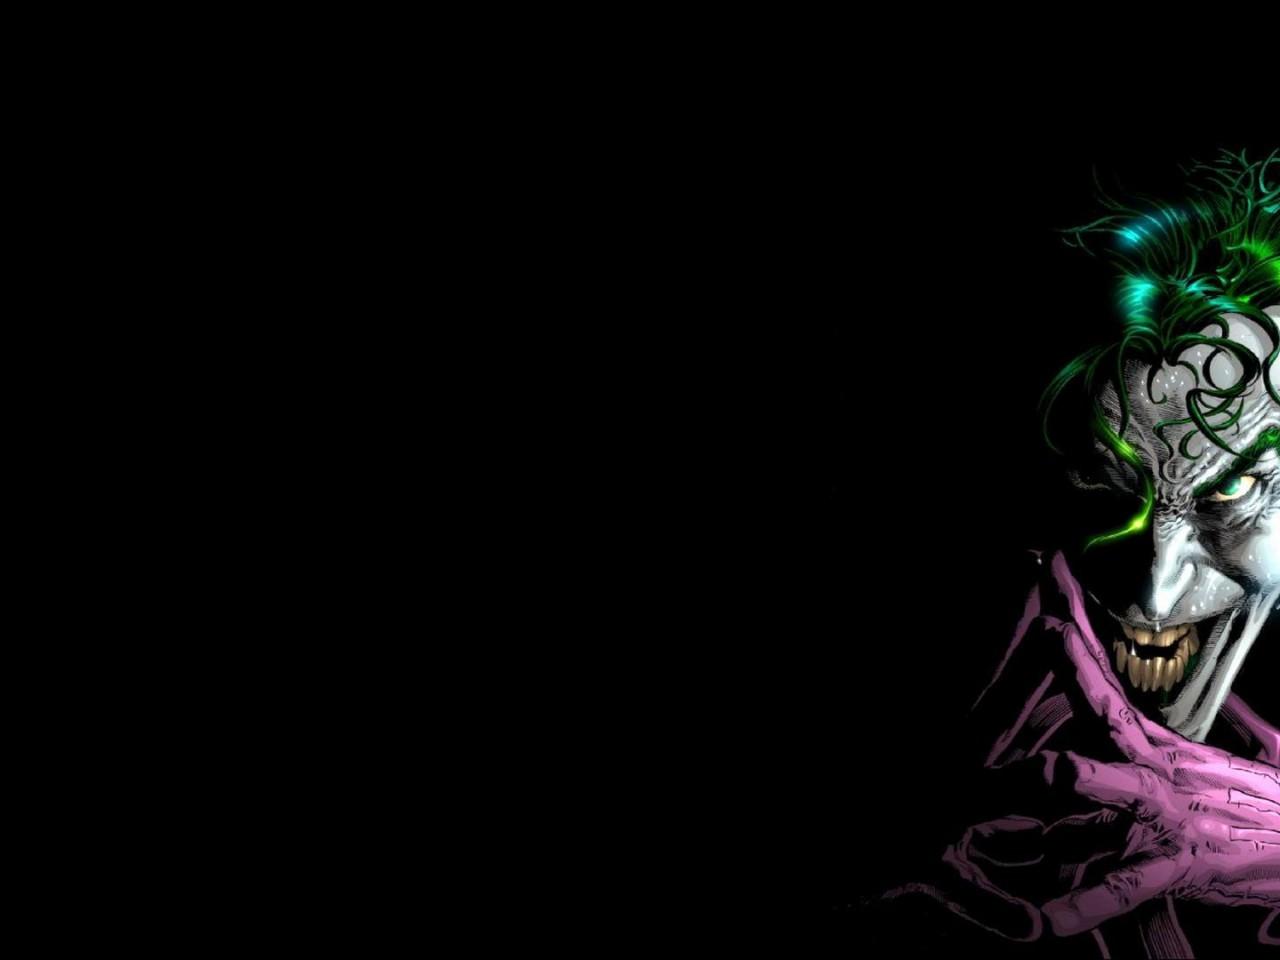 animowane ta le joker hd tapety na pulpit widescreen 1280x960